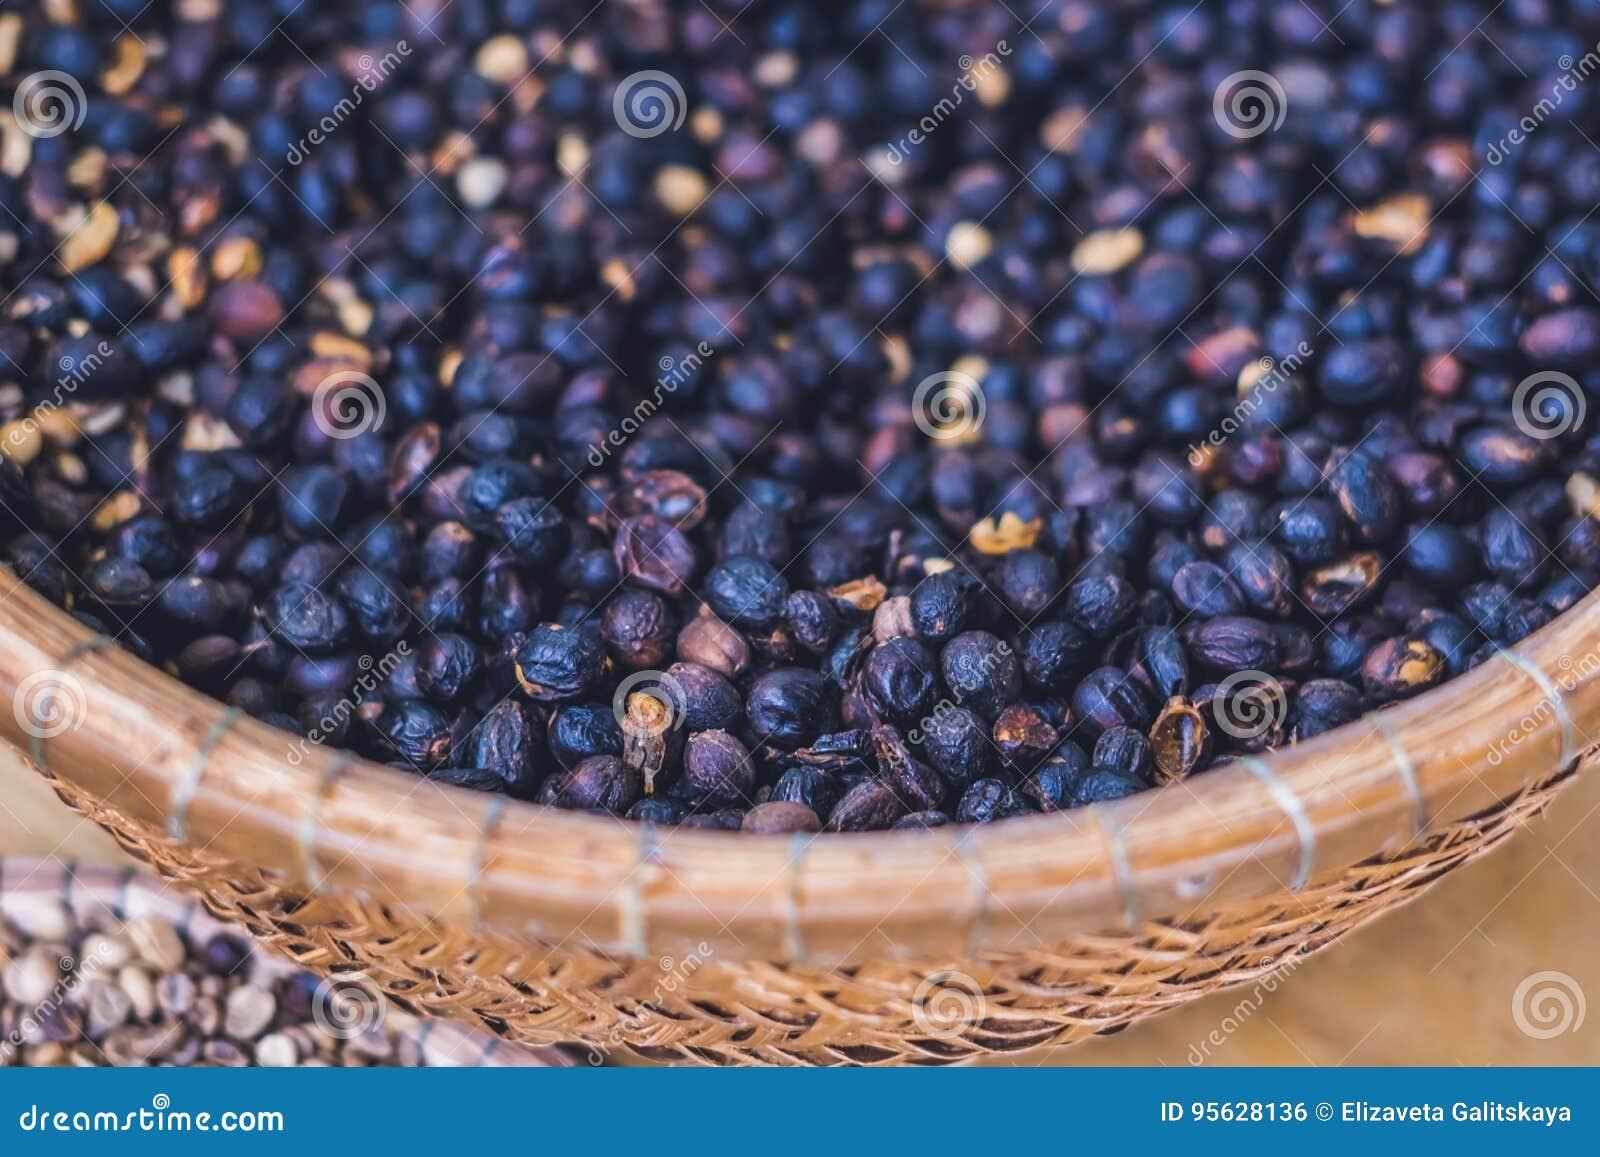 Civet Coffee ,Kopi Luwak ,Weasel Coffee ,raw Material For ...